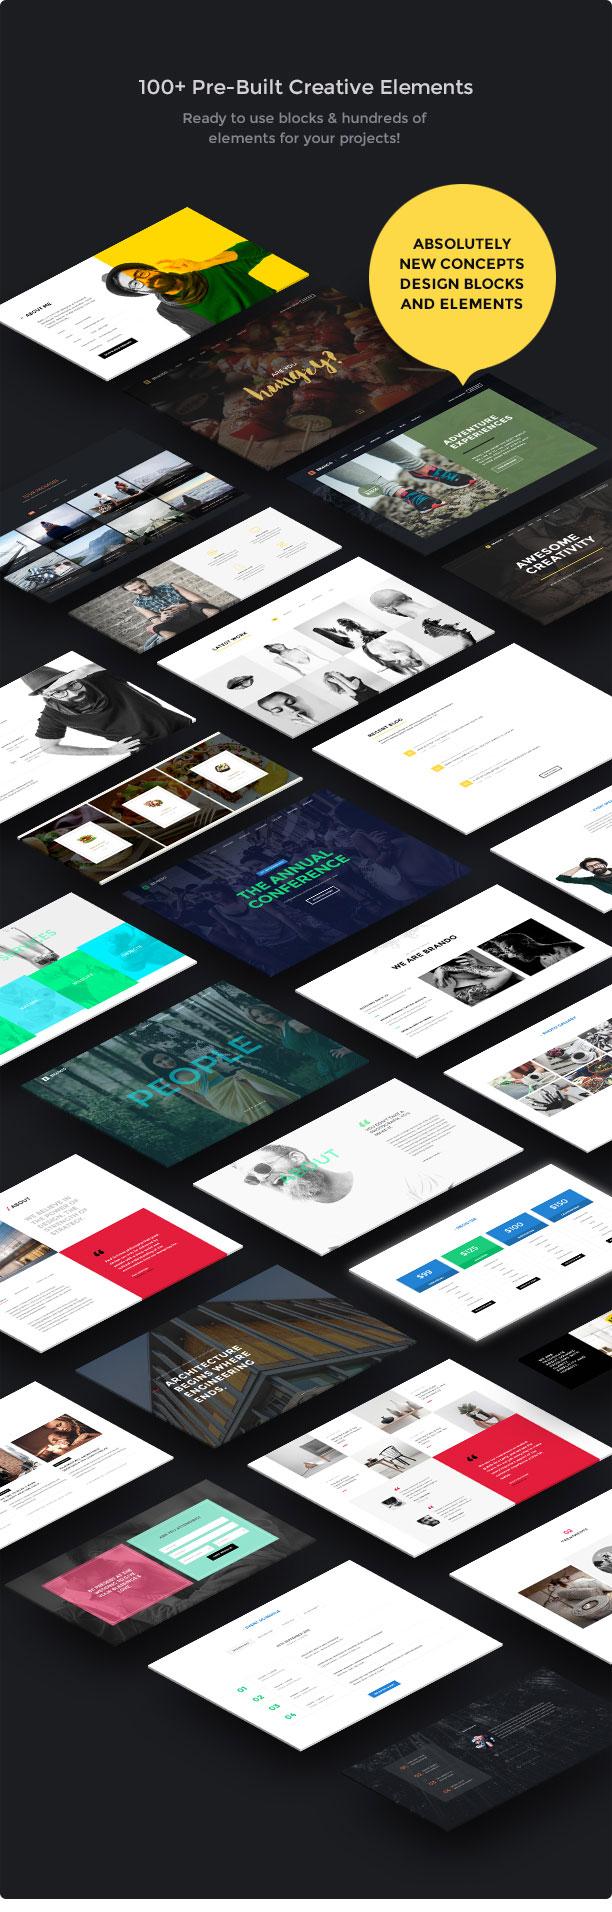 Brando Responsive and Multipurpose OnePage WordPress Theme - 22